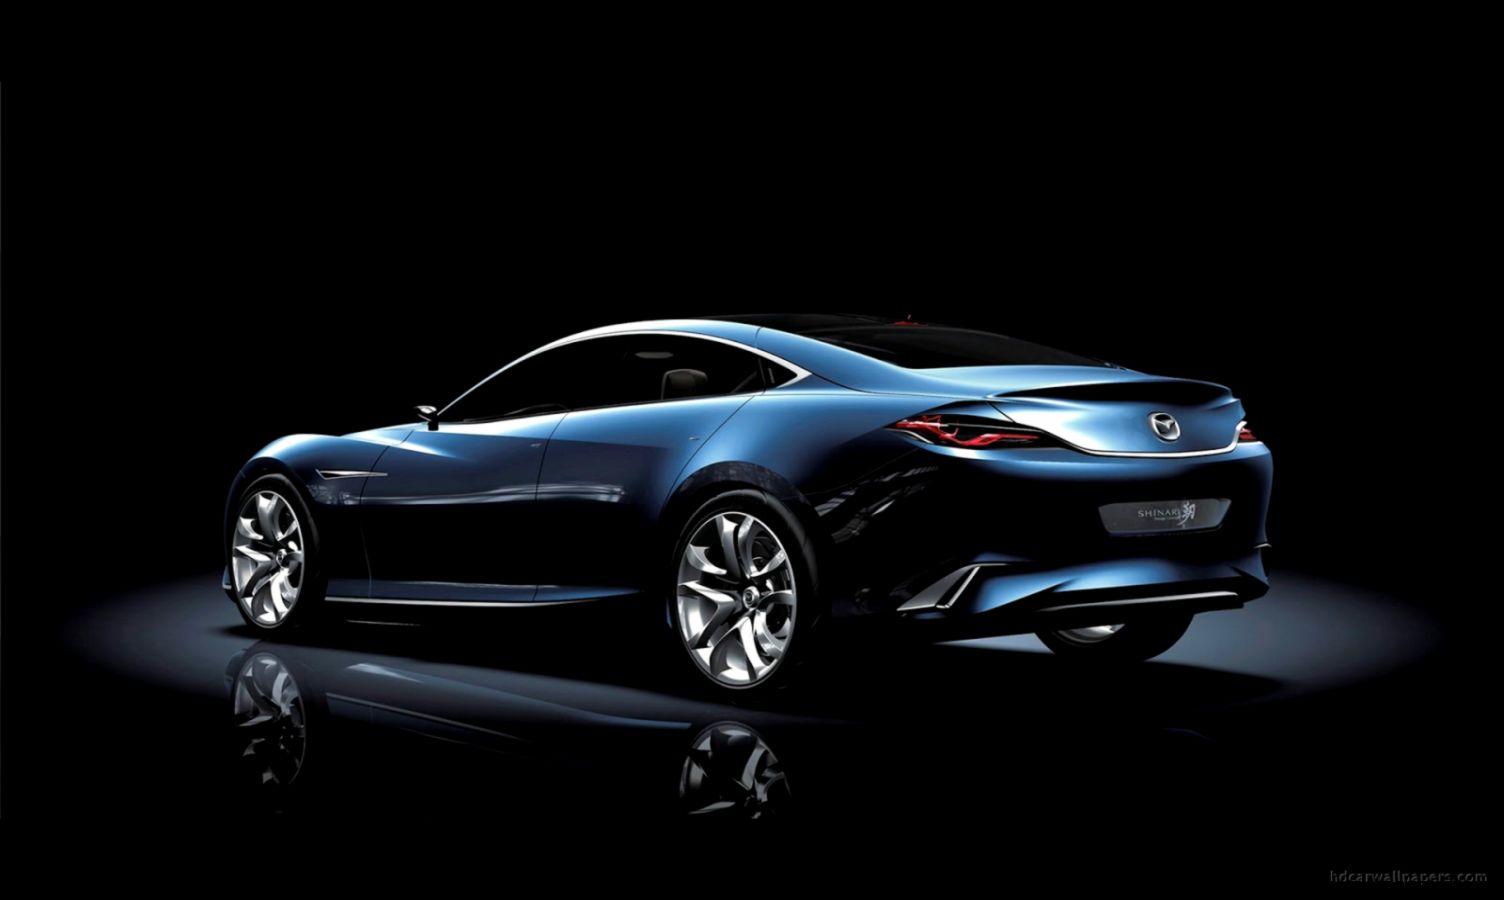 Mazda Car Rain Hd Wallpaper  Free High Definition Wallpapers